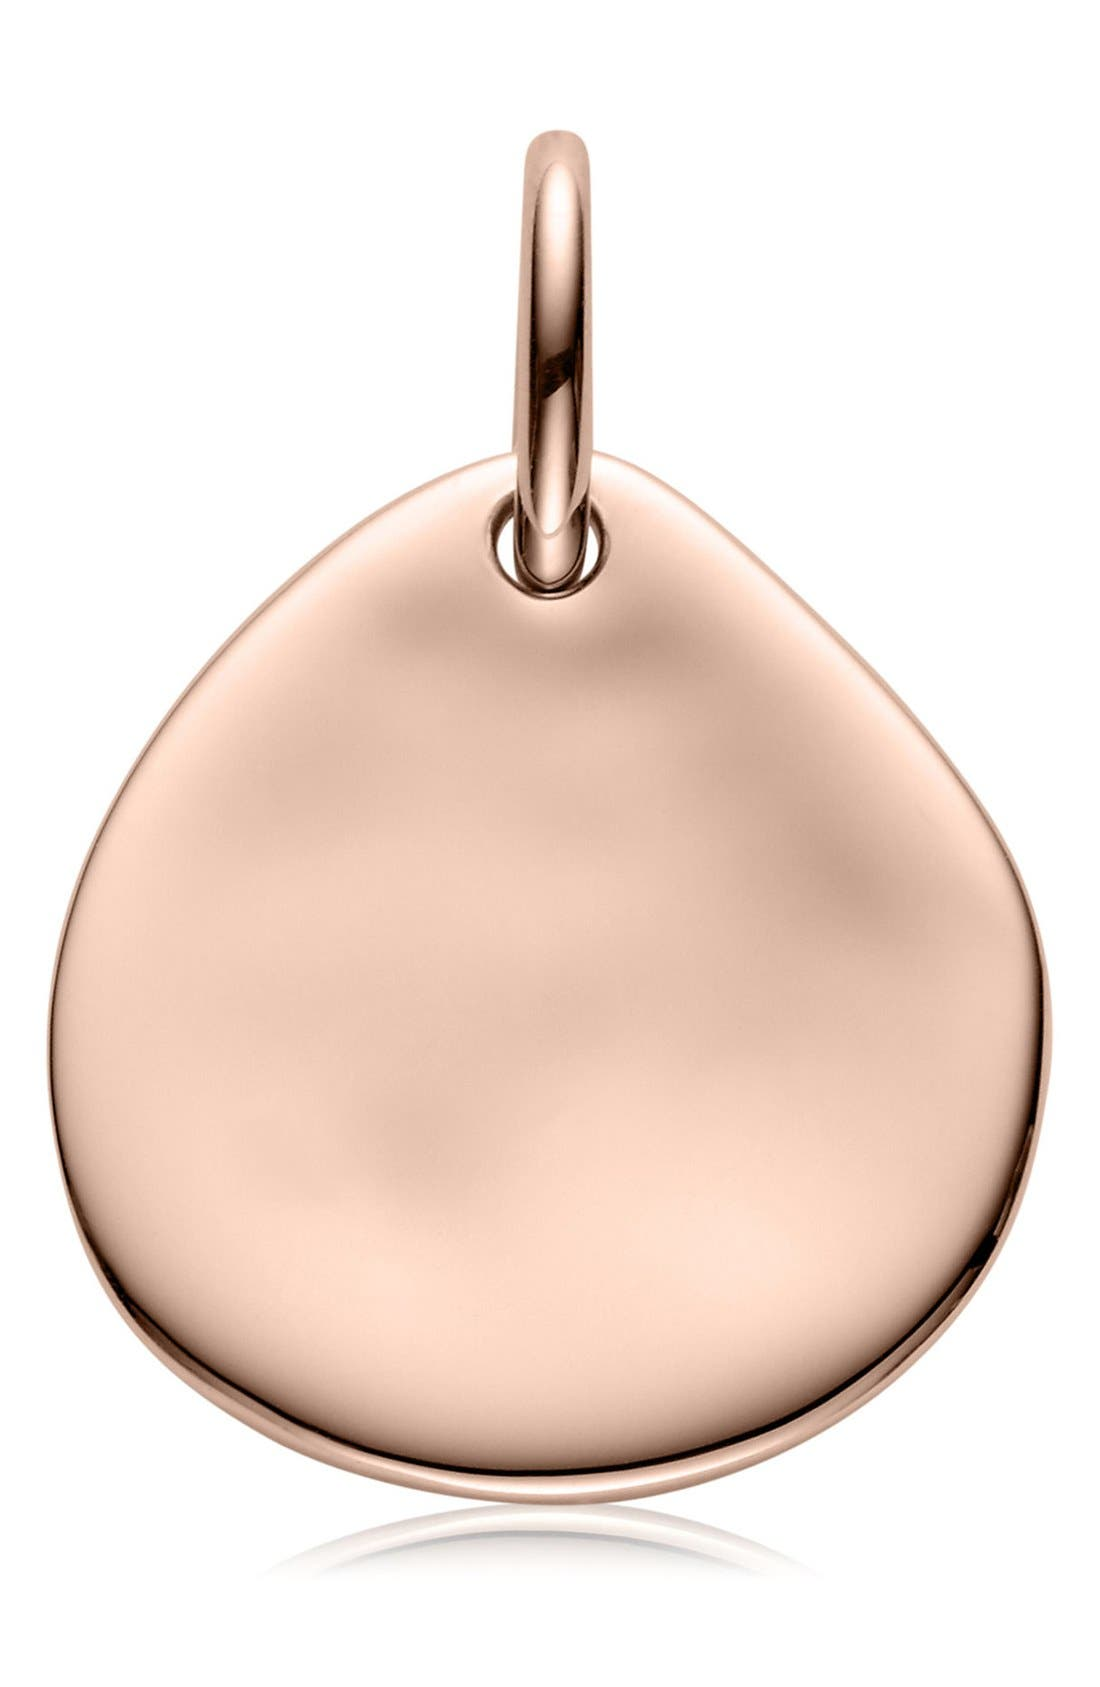 Engravable Siren Small Pendant,                             Main thumbnail 1, color,                             Rose Gold